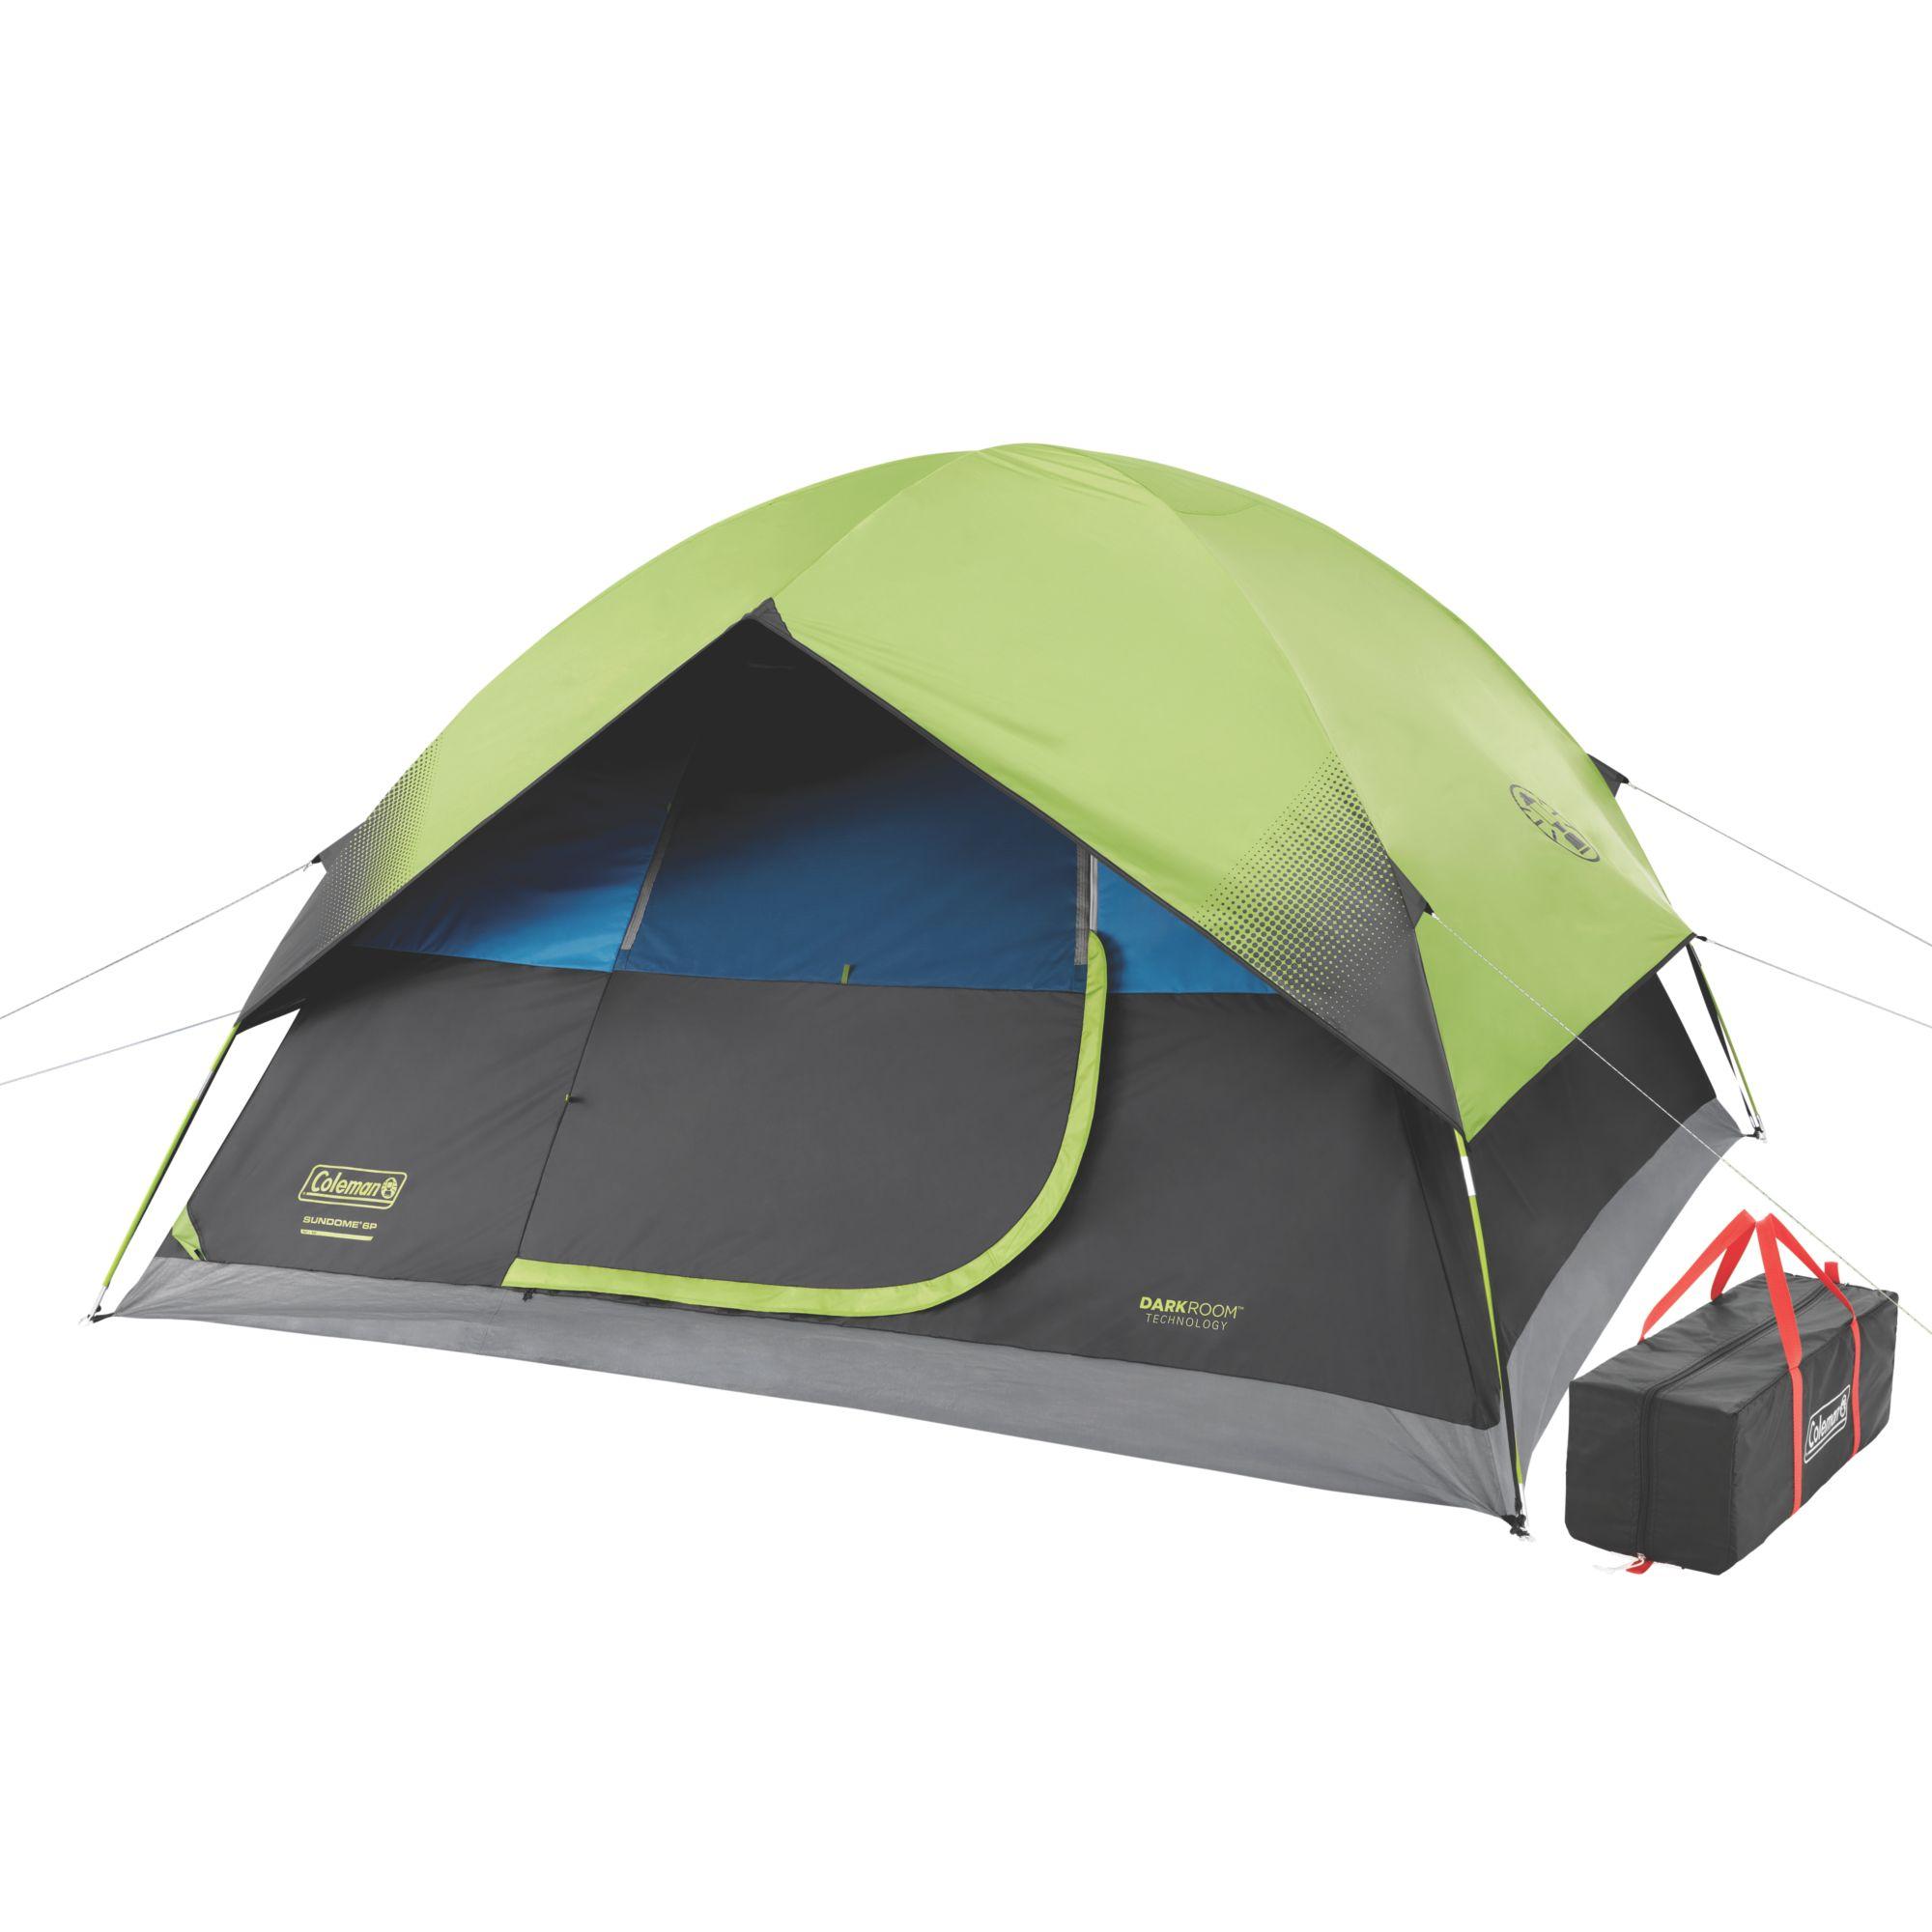 6-Person Dark Room Sundome Tent | Coleman